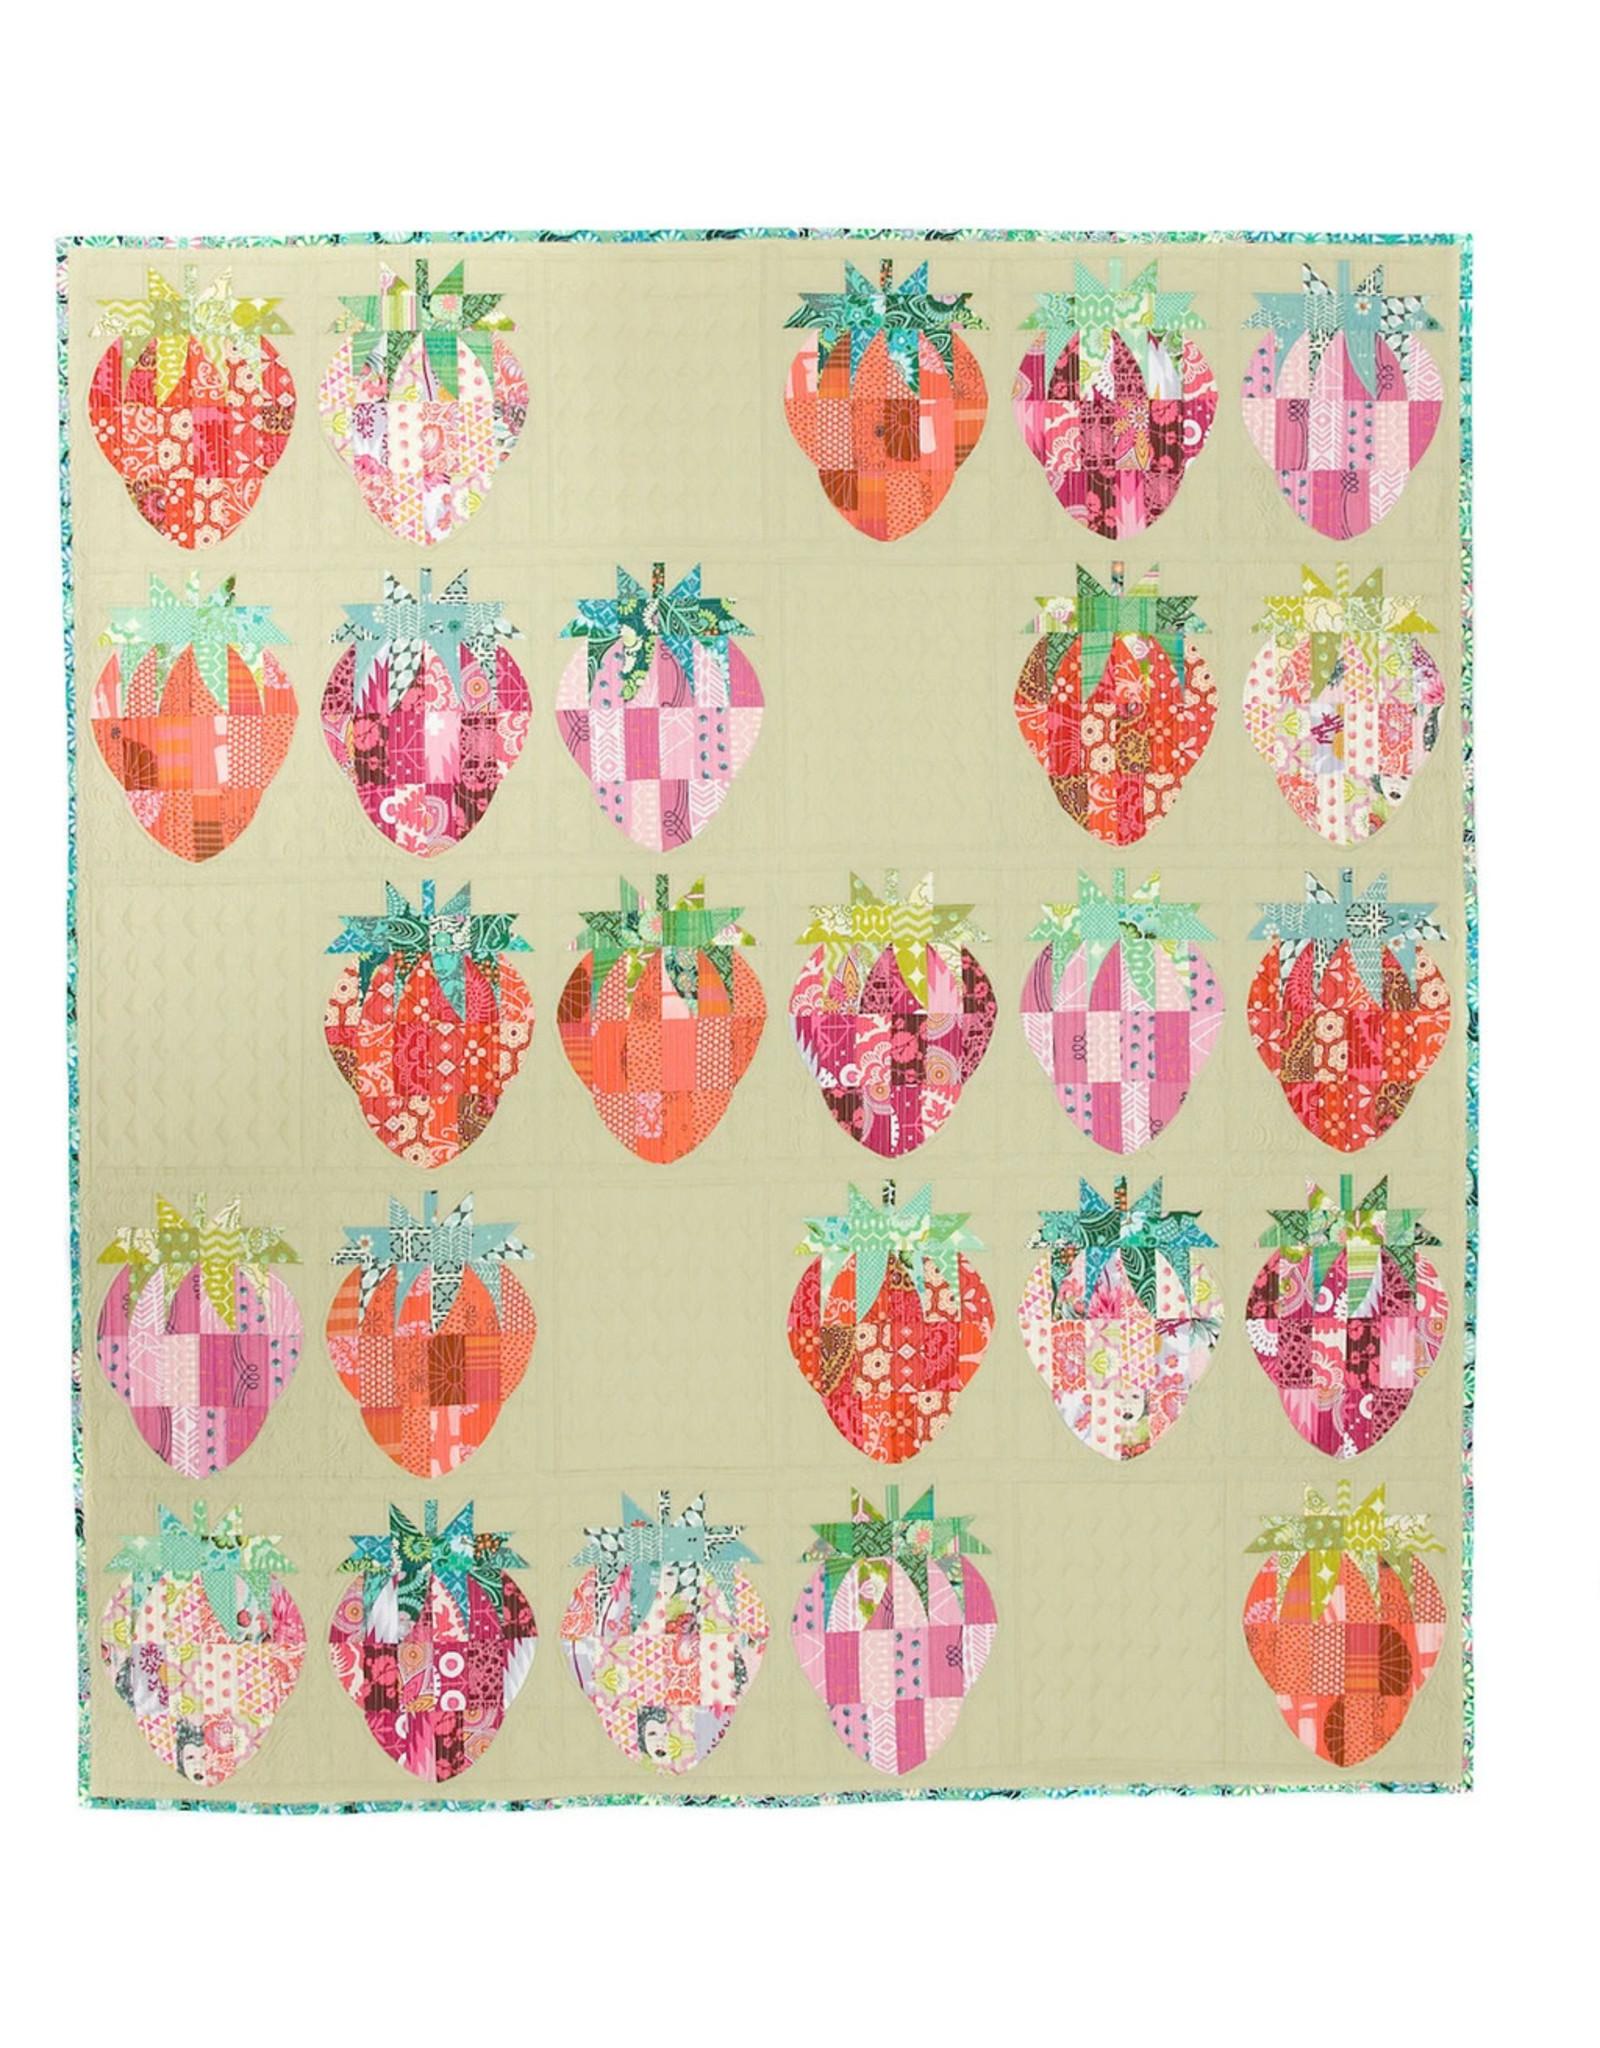 Sew Kind of Wonderful Mod Strawberries Quilt Pattern